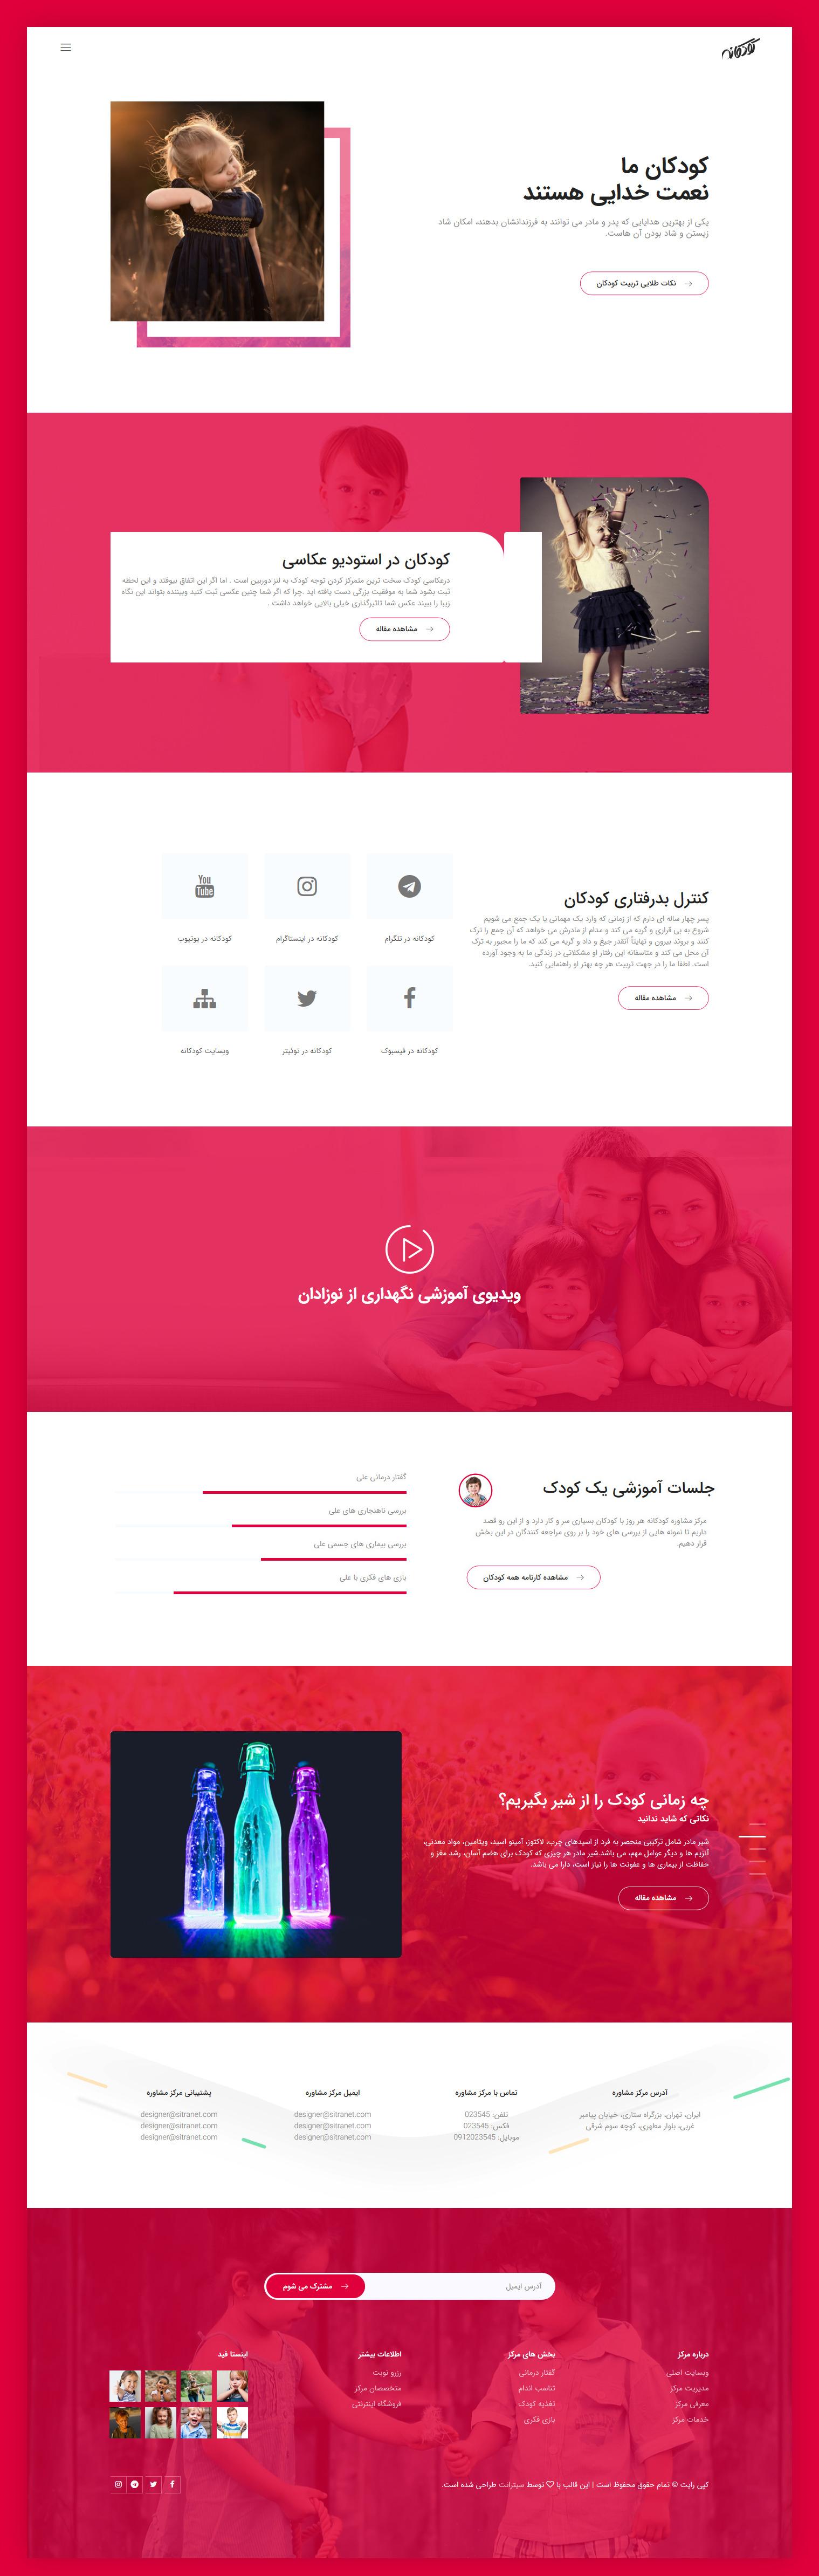 قالب HTML Kodakaneh | پوسته HTML صفحه فرود